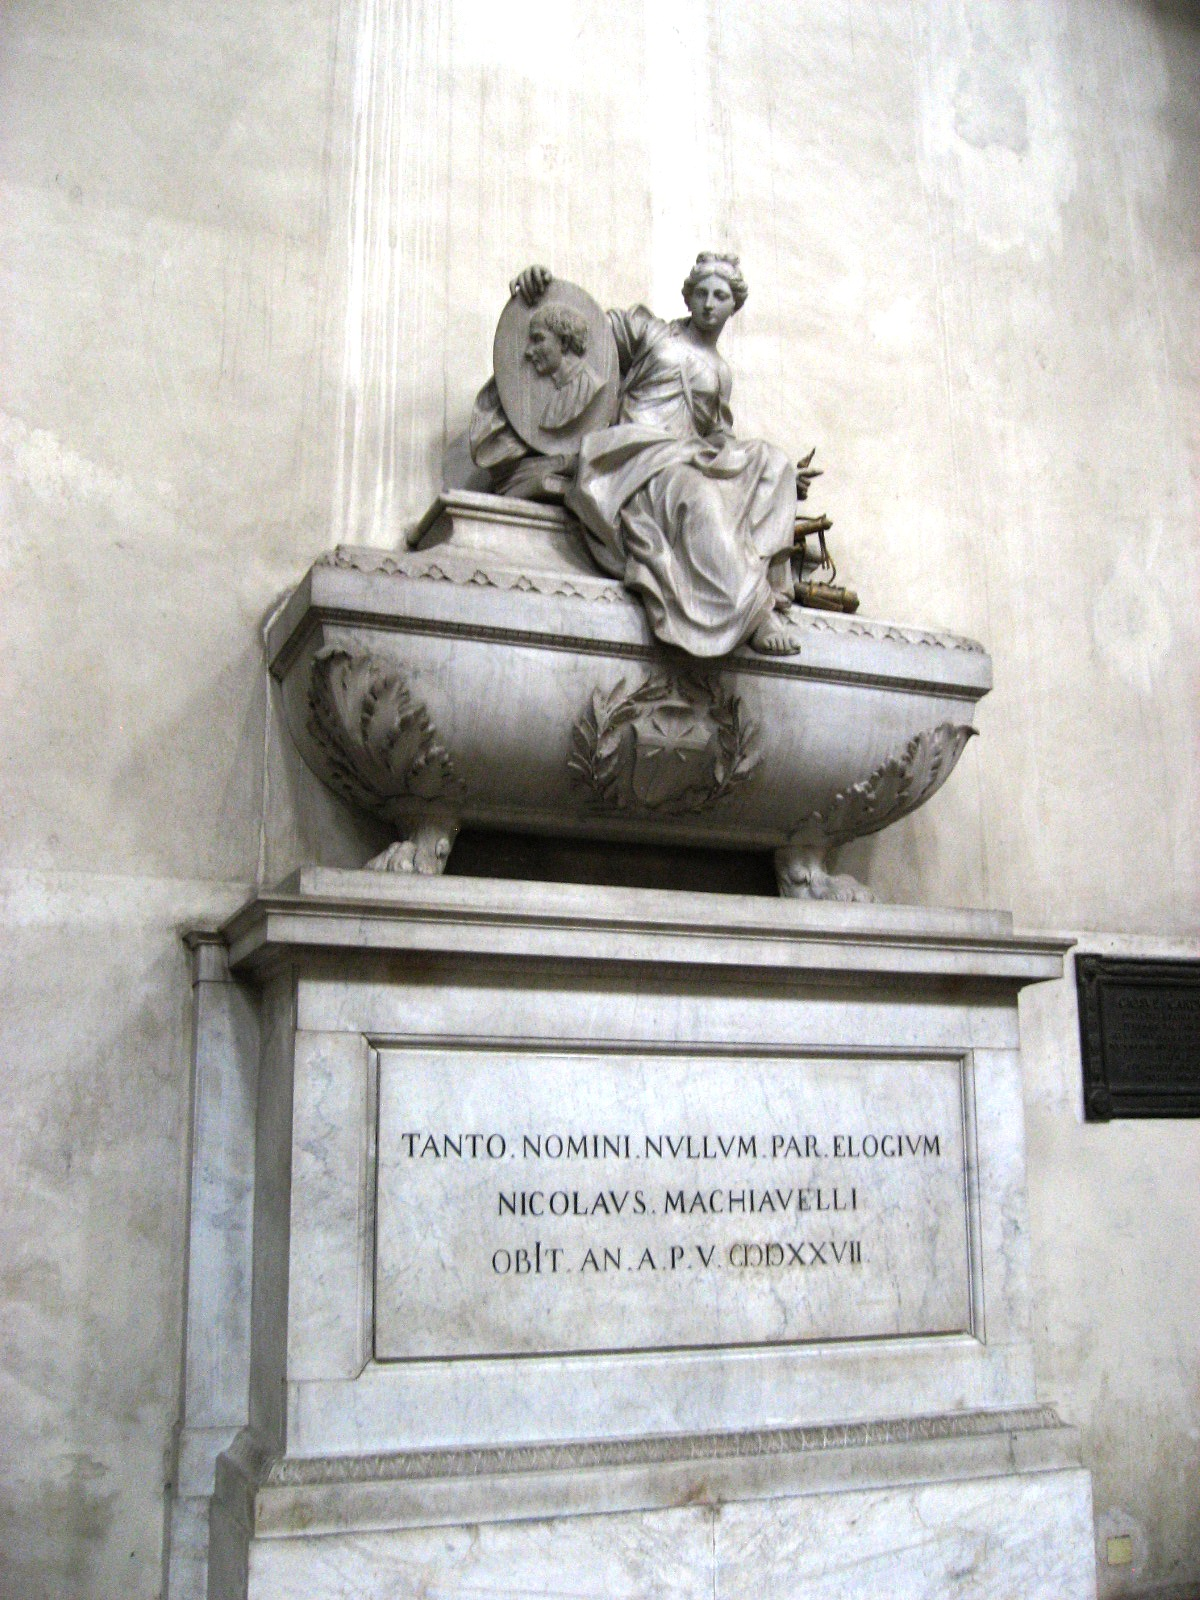 5. Tomb of Niccolò Machiavelli in the Basilica of Santa Croce in Florence